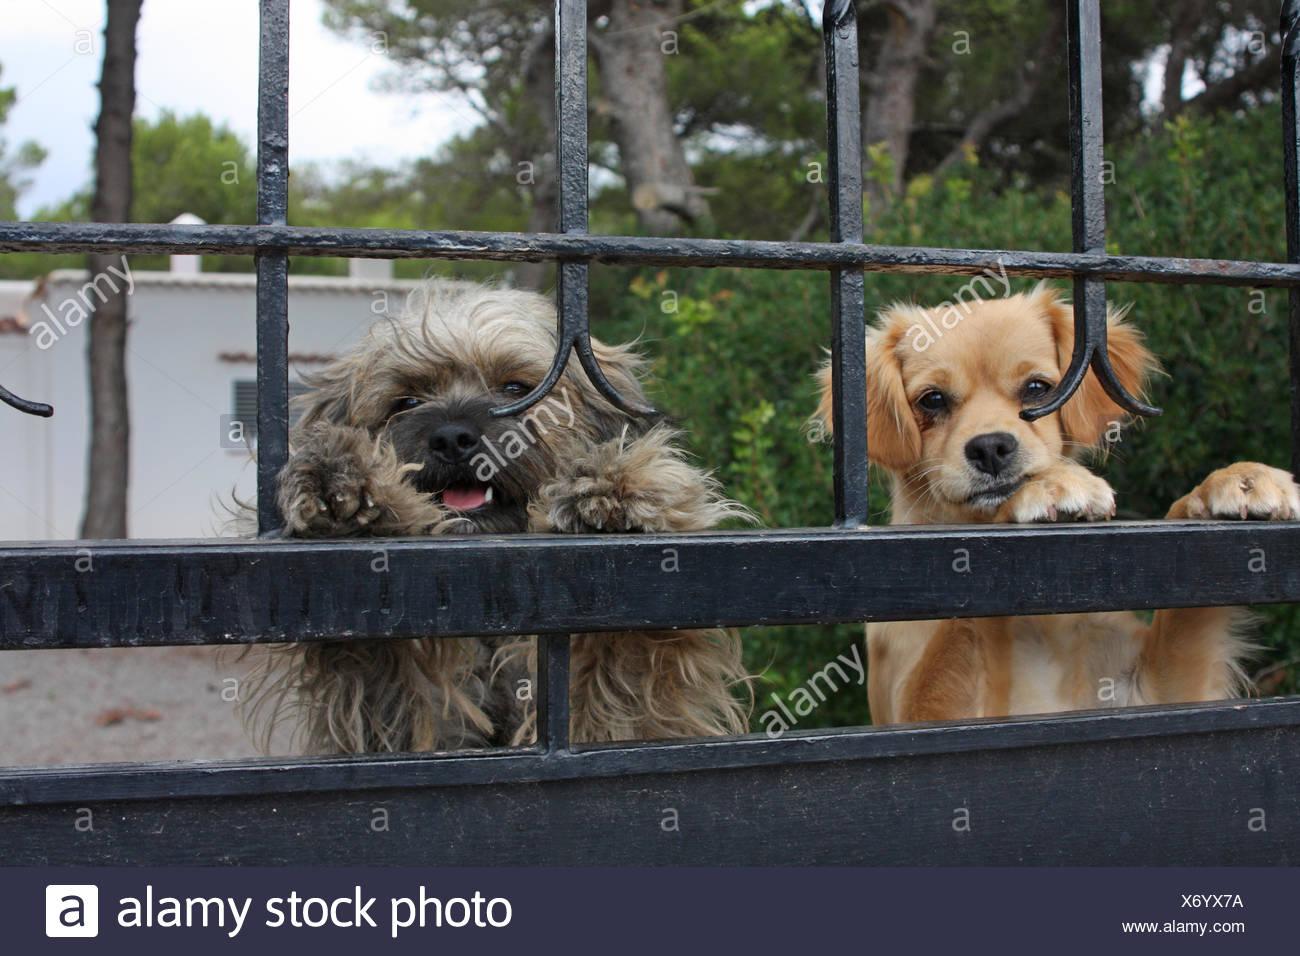 Hunde hinter einem Zaun Stockfoto, Bild: 279667118 - Alamy